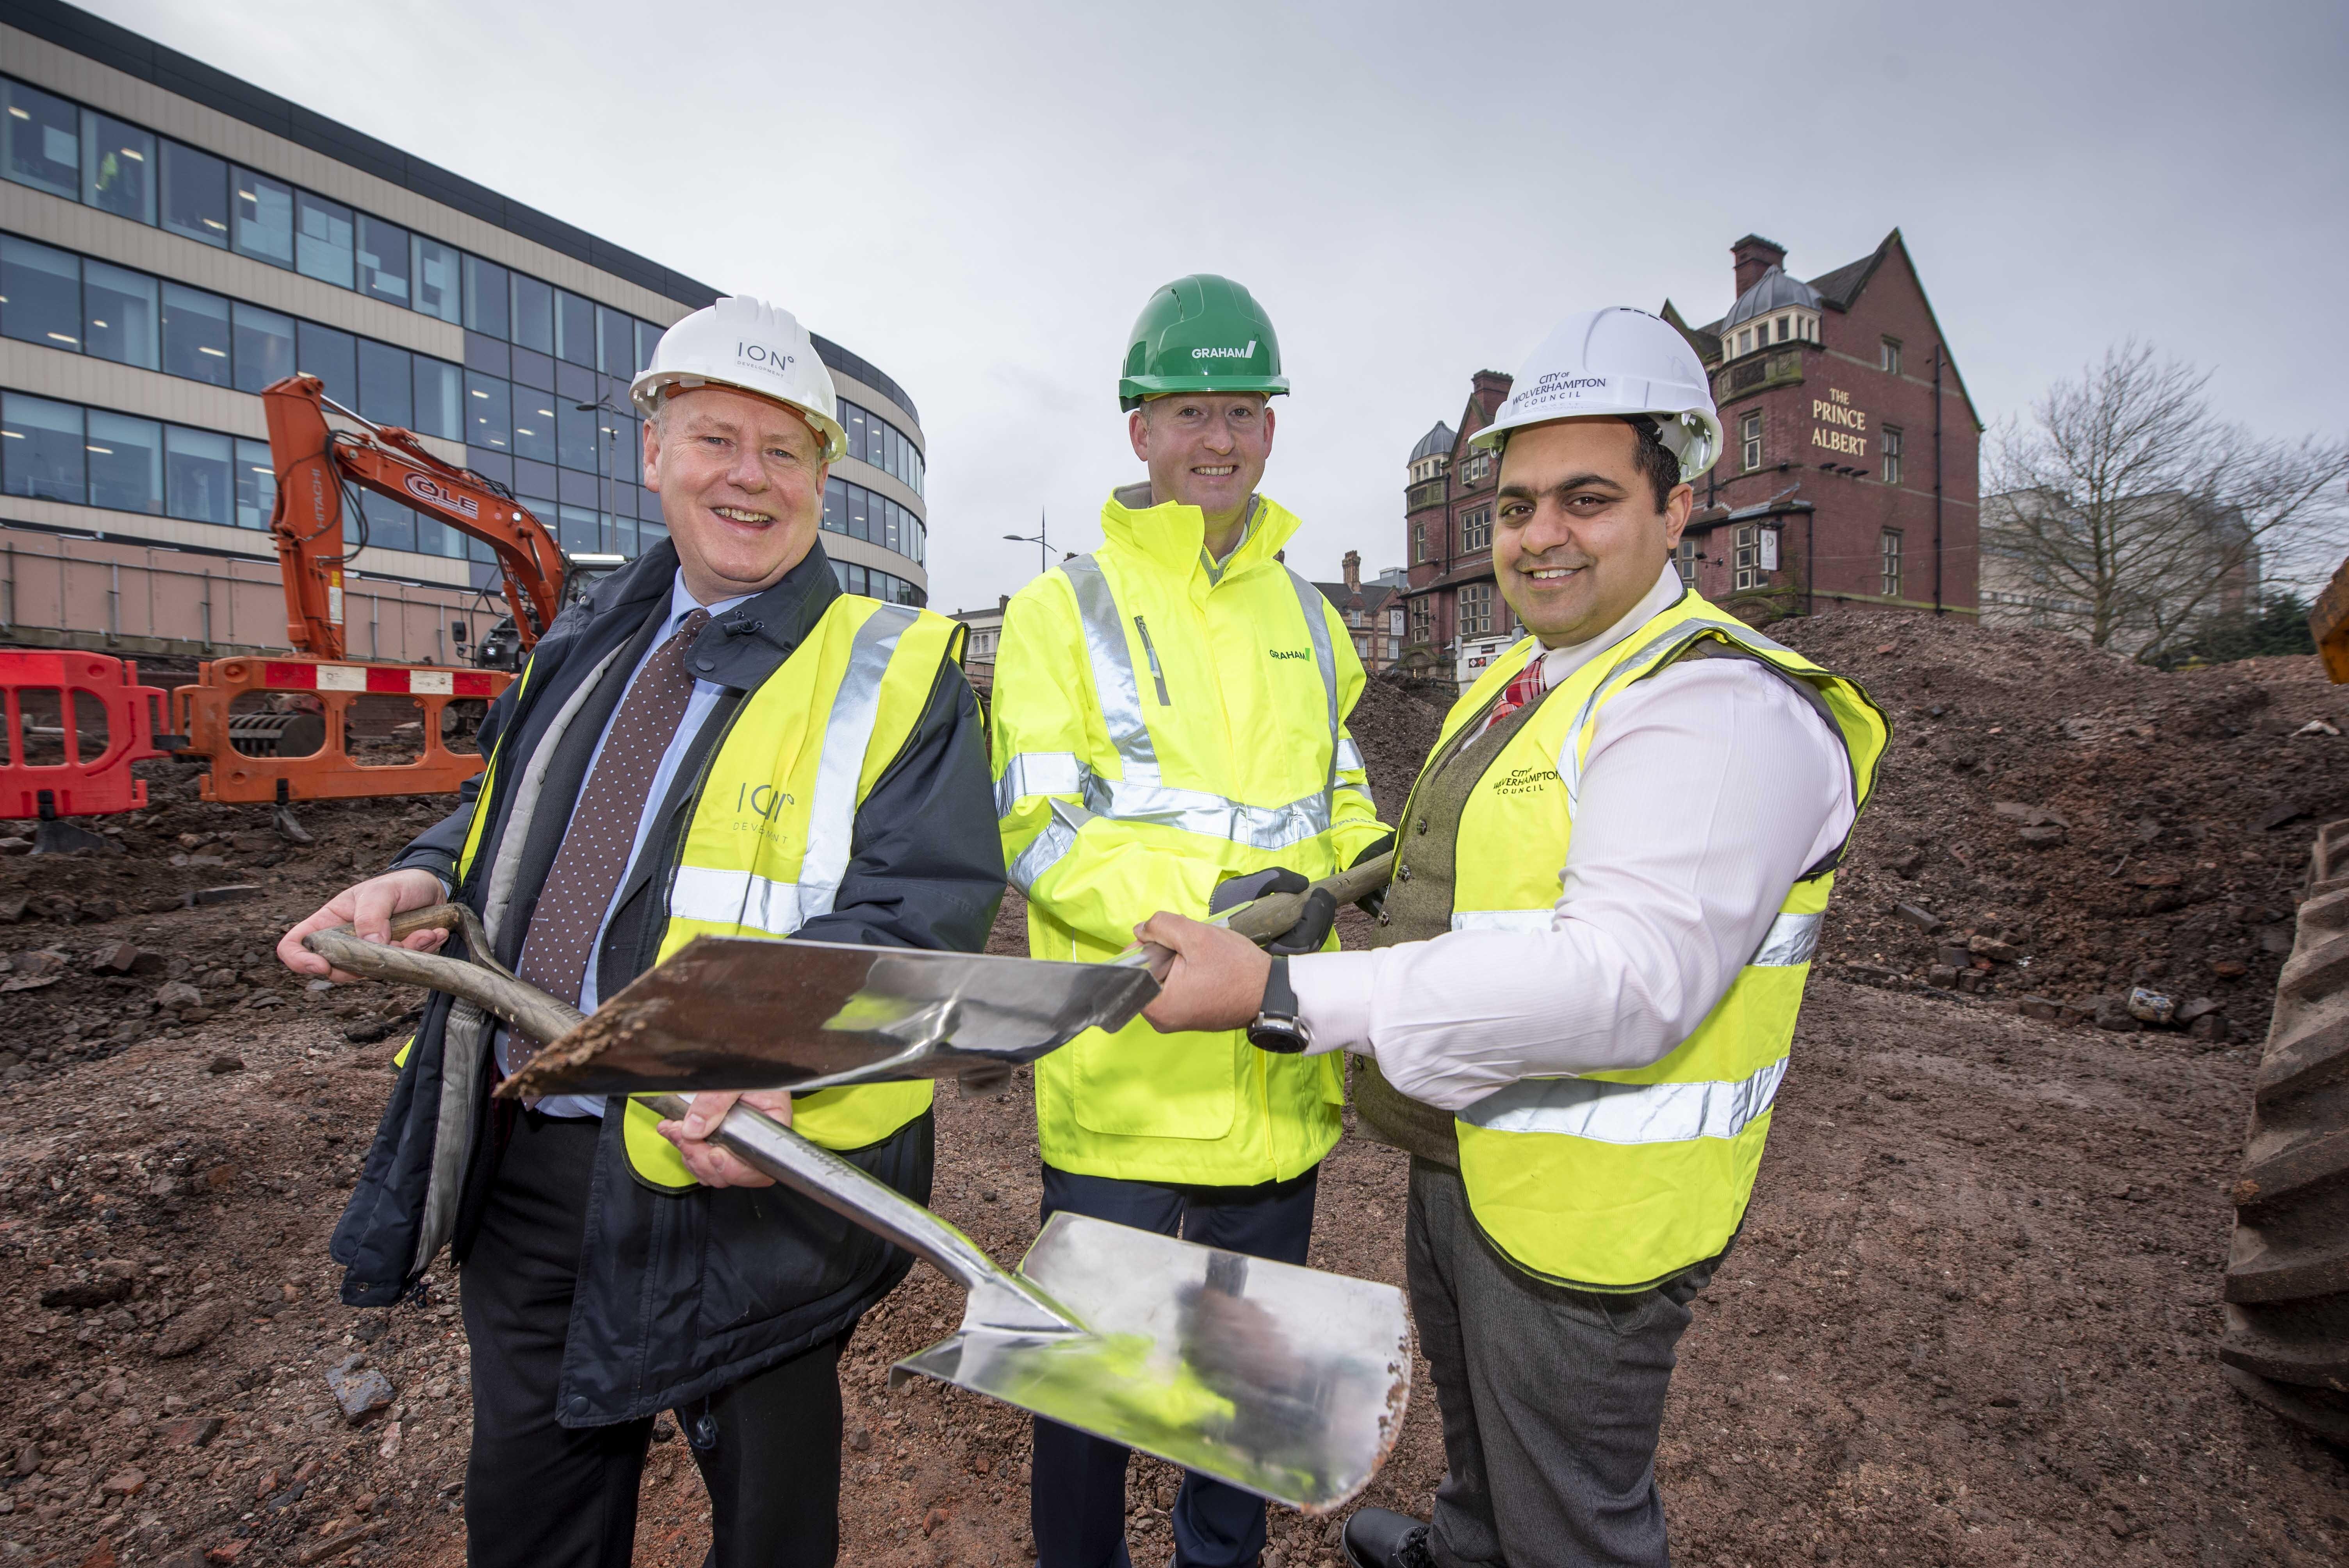 Construction works start on i9 office development image